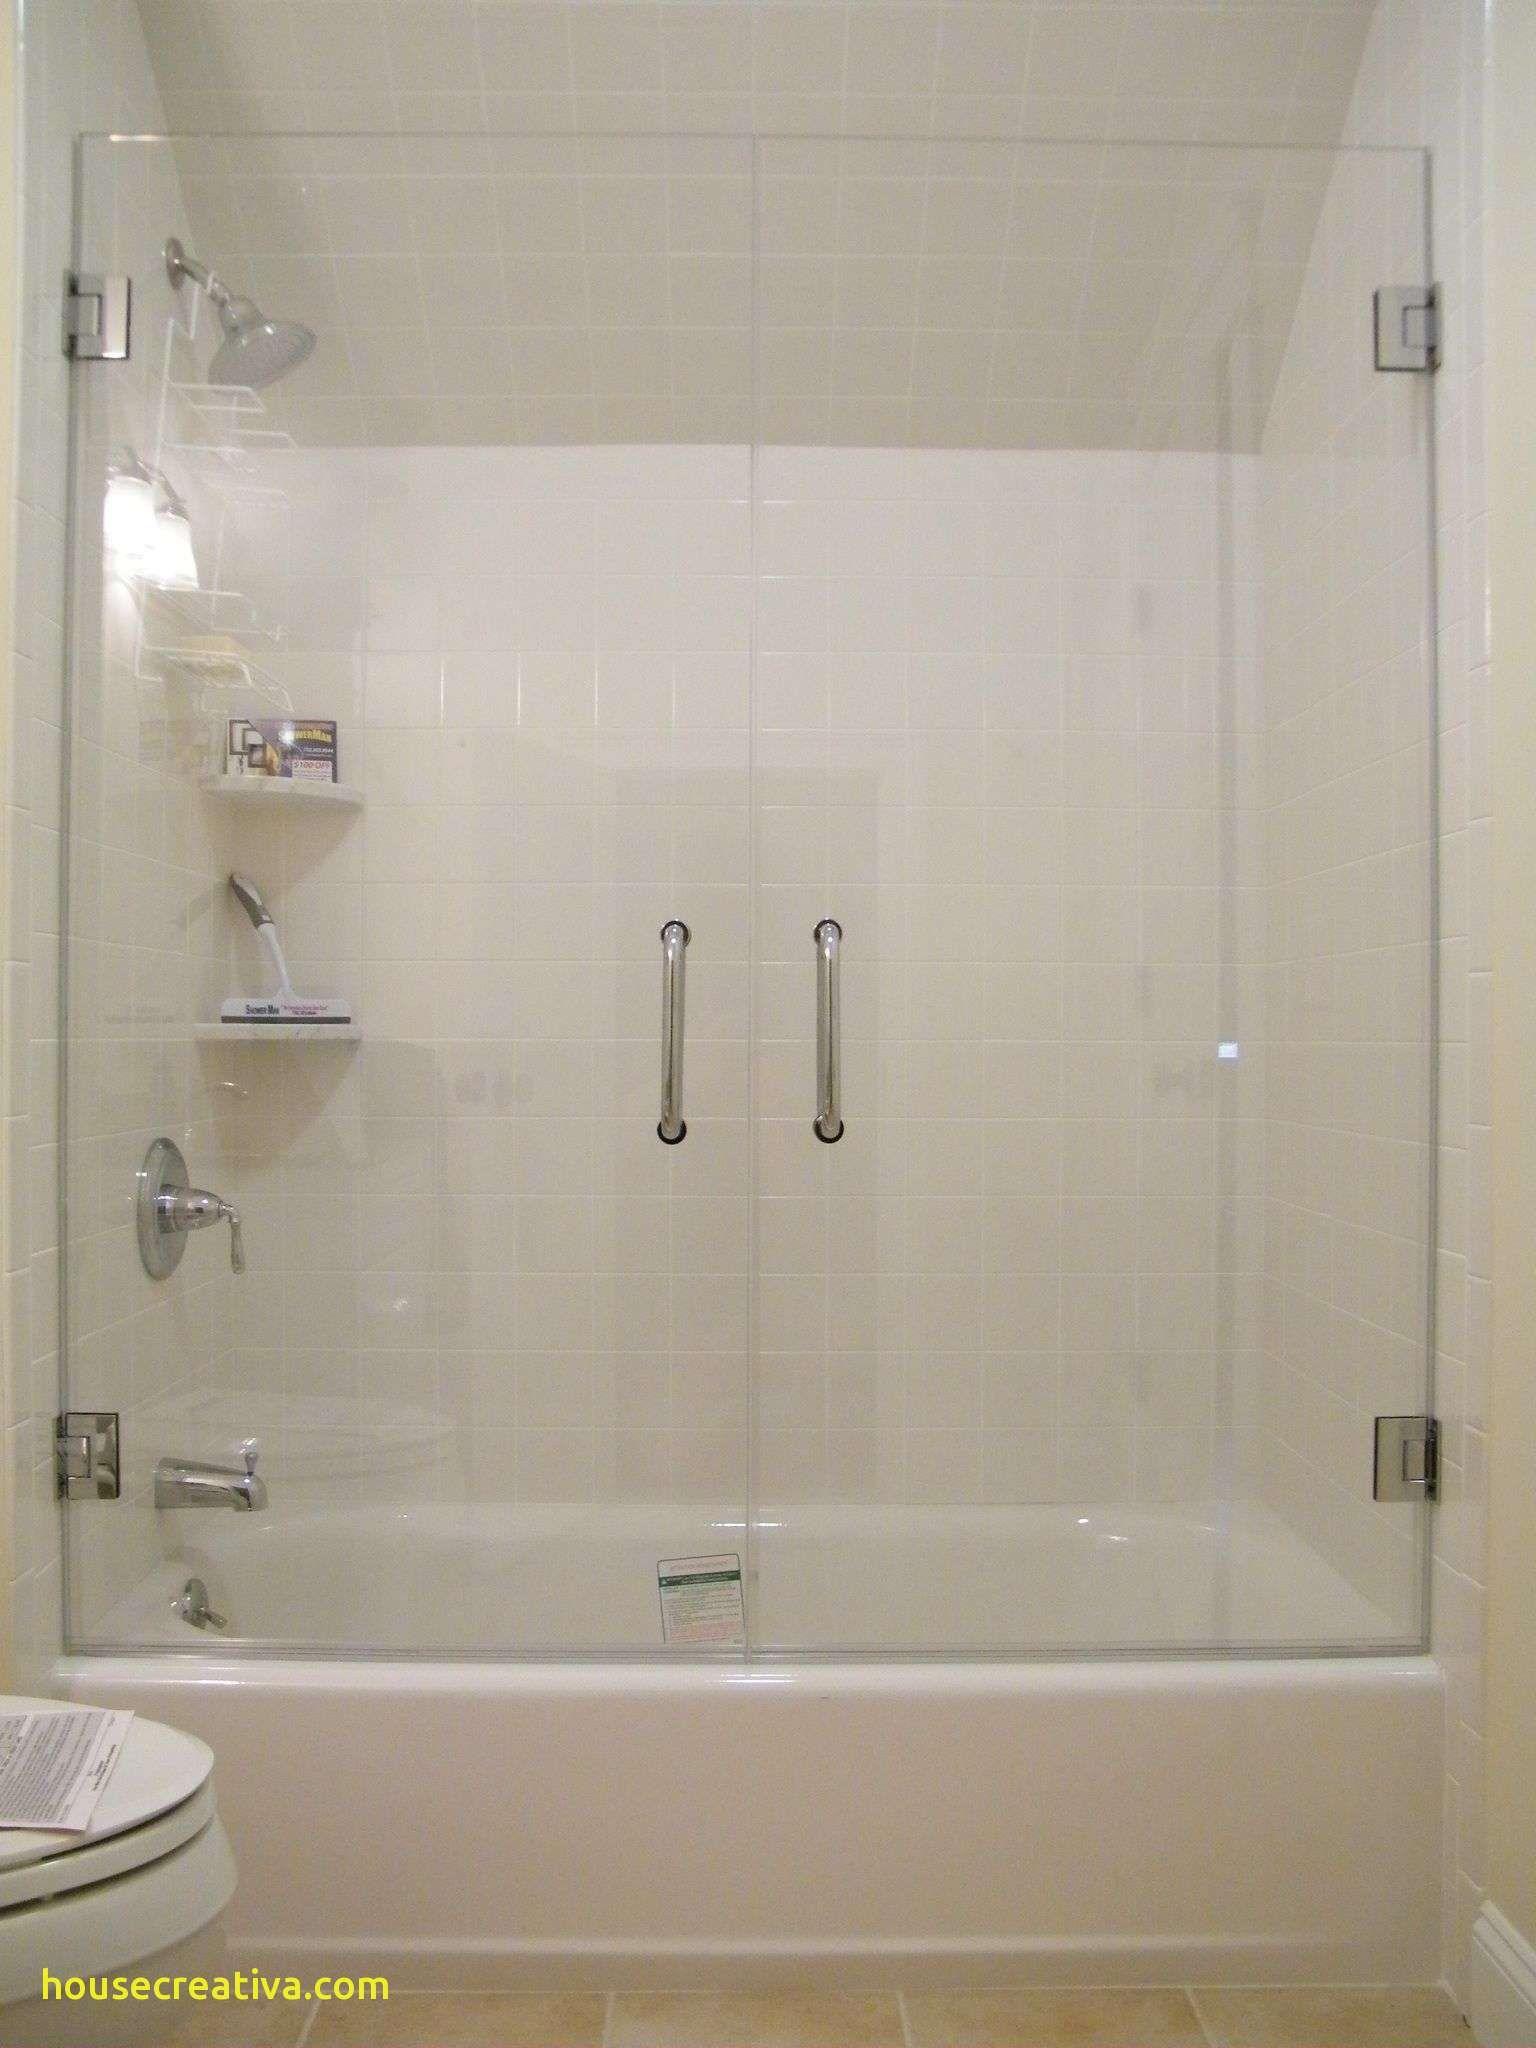 Beautiful Frameless Shower Door Over Tub Homedecoration